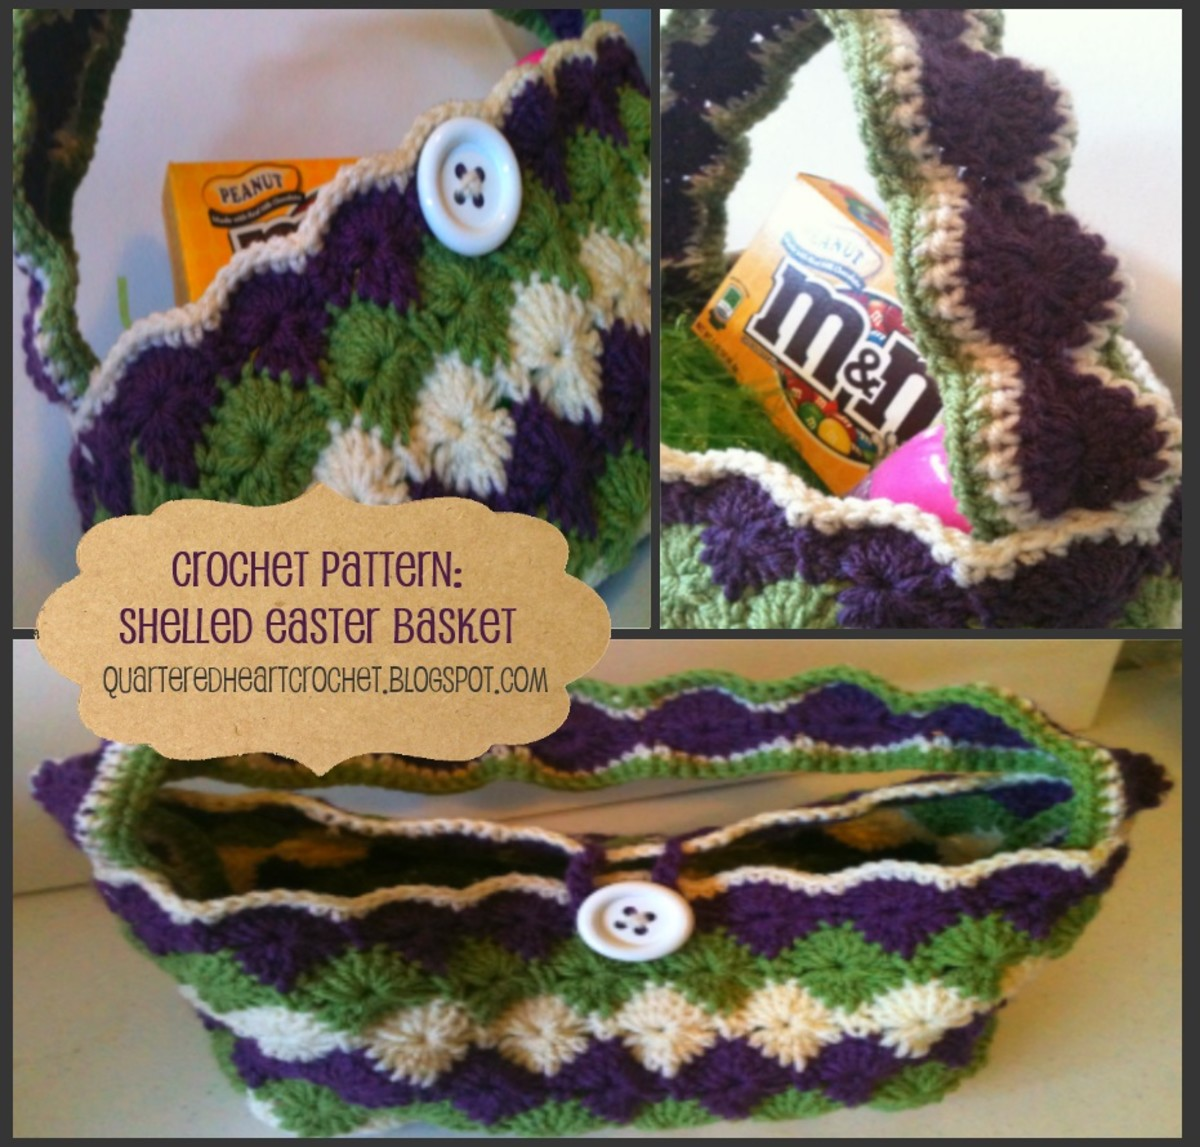 shelled-crochet-easter-basket-pattern